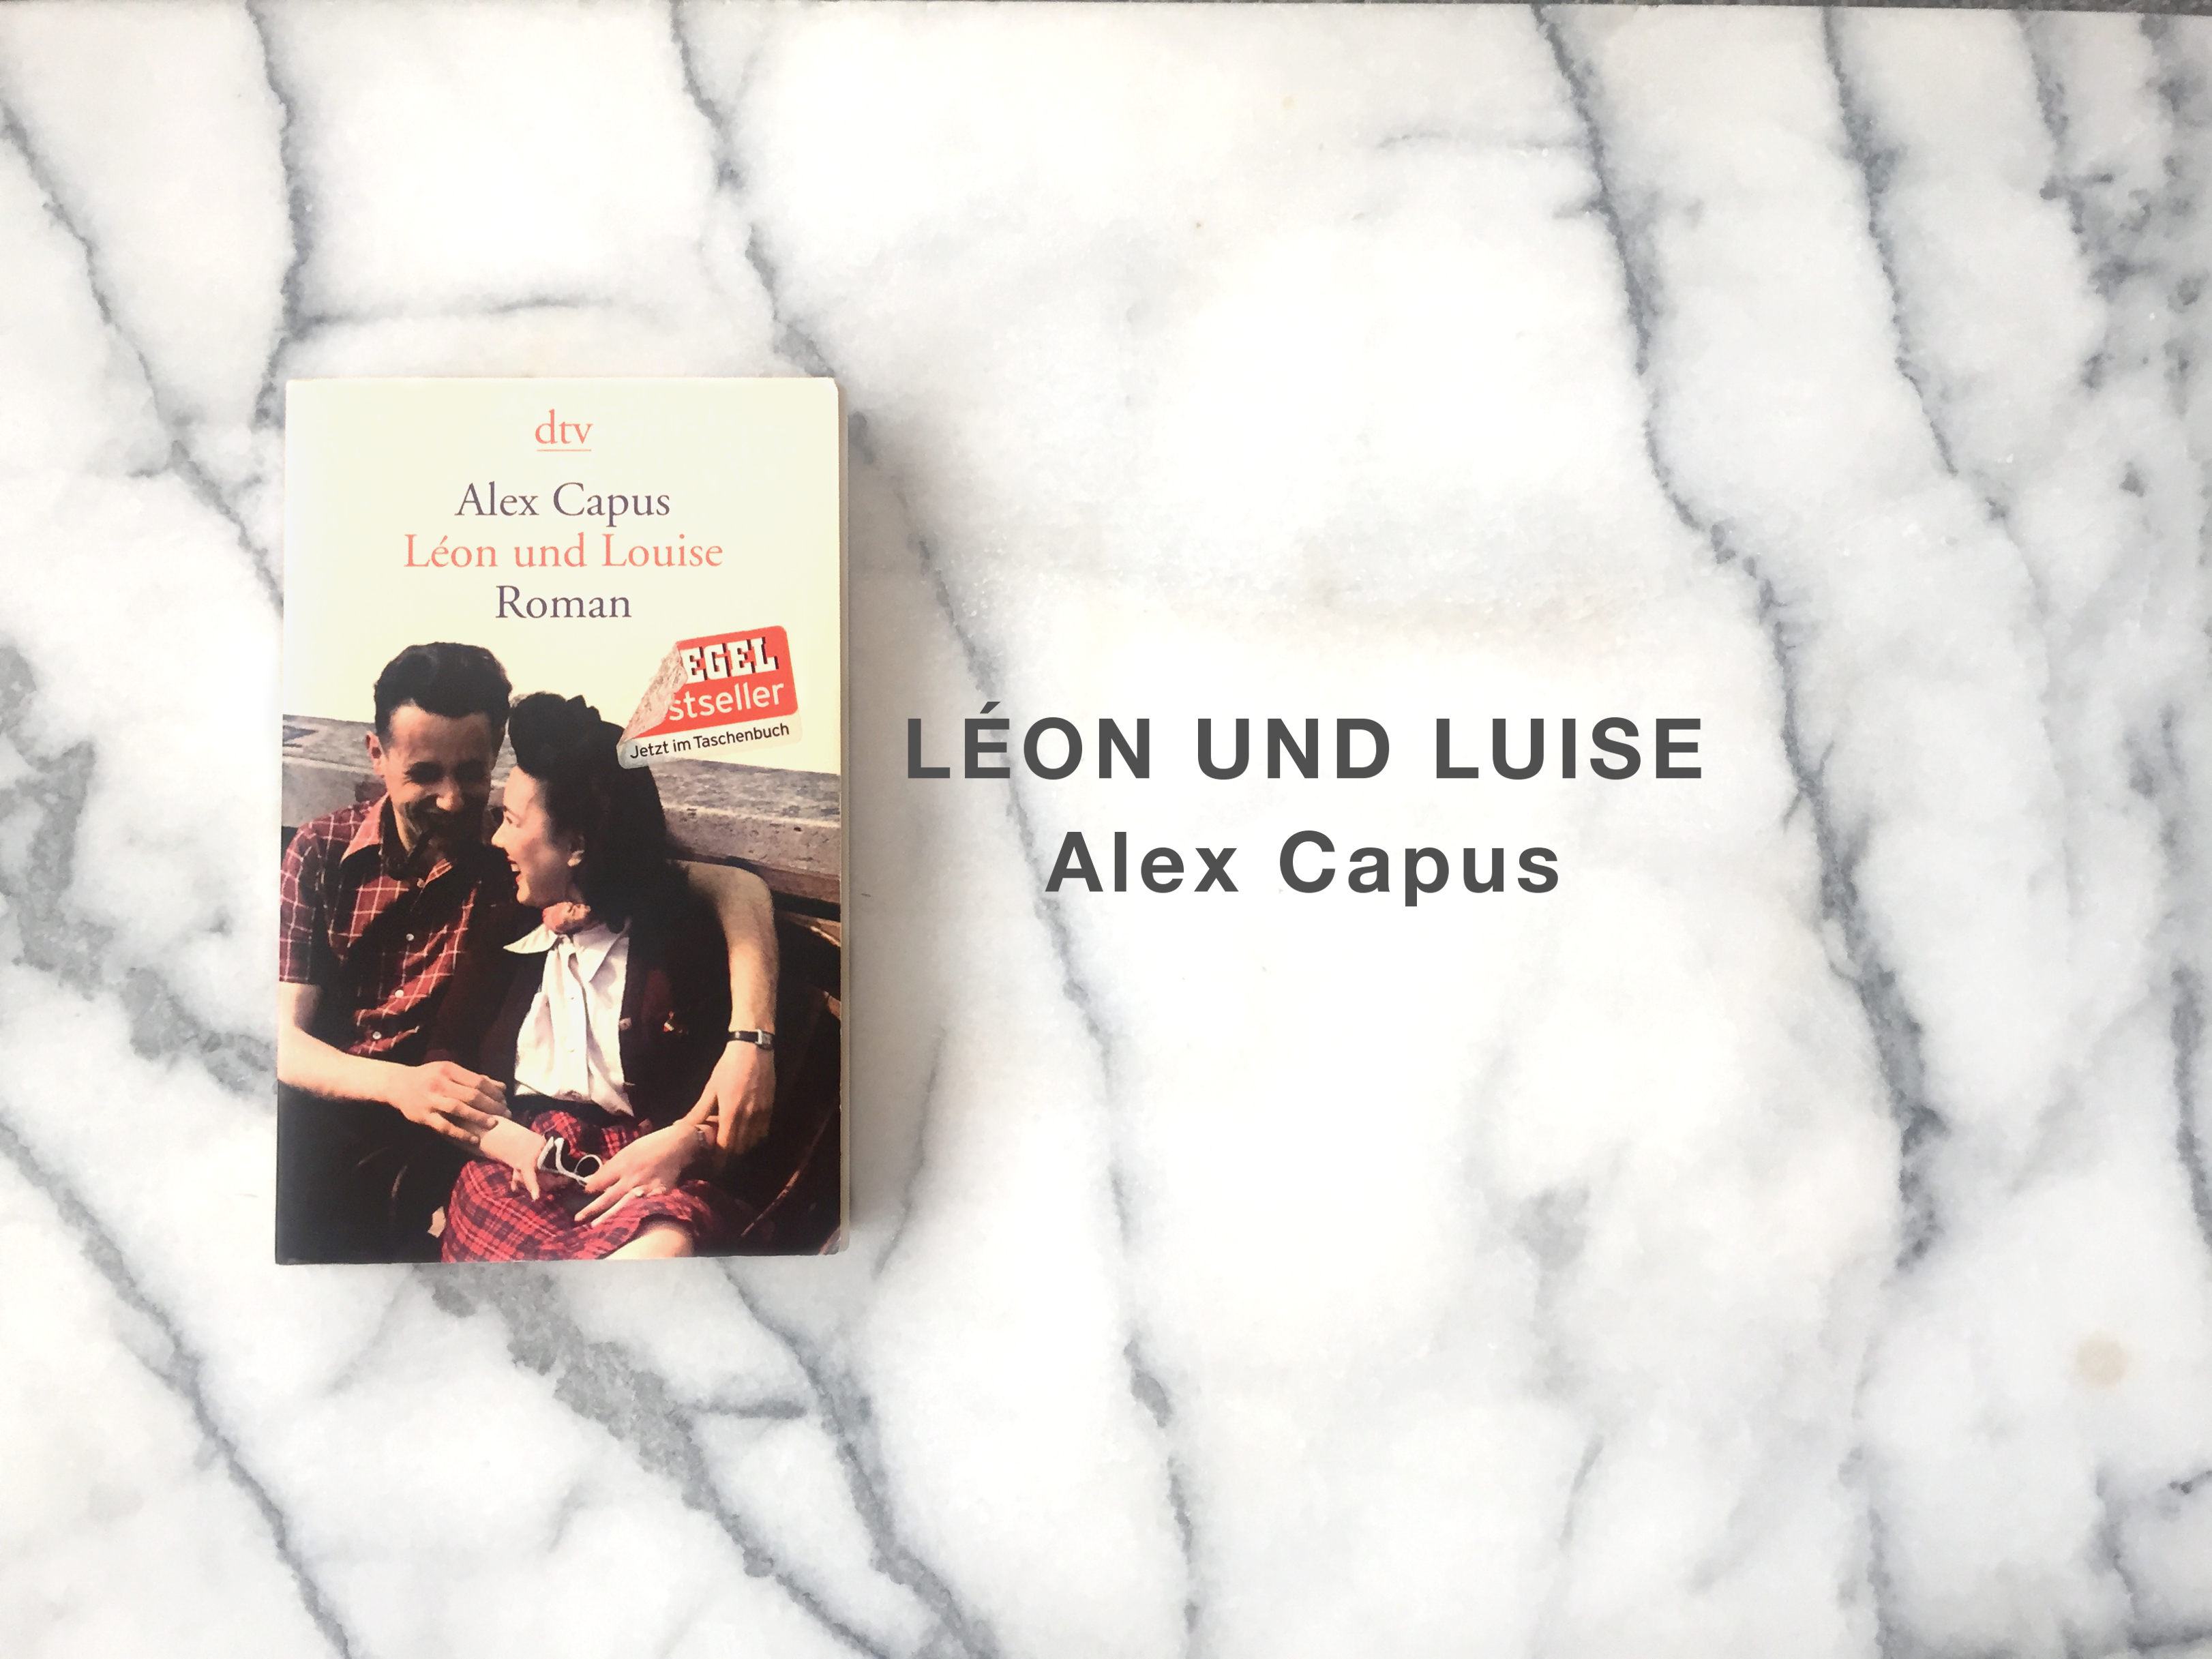 Alex Capus Leon und Luise Léon